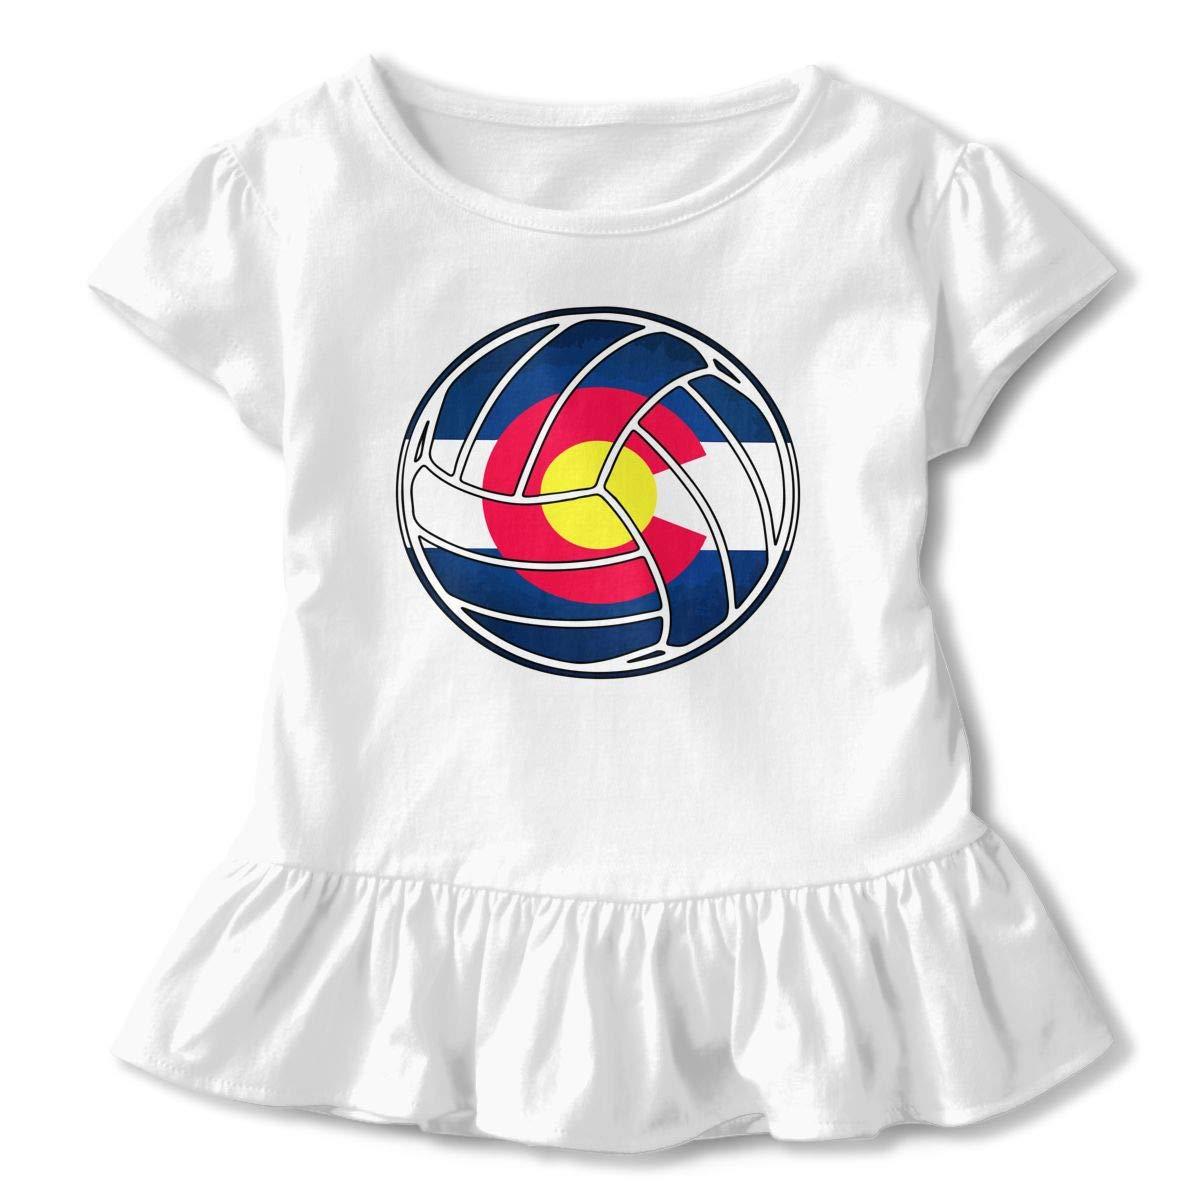 Cheng Jian Bo Colorado Flag Volleyball Toddler Girls T Shirt Kids Cotton Short Sleeve Ruffle Tee